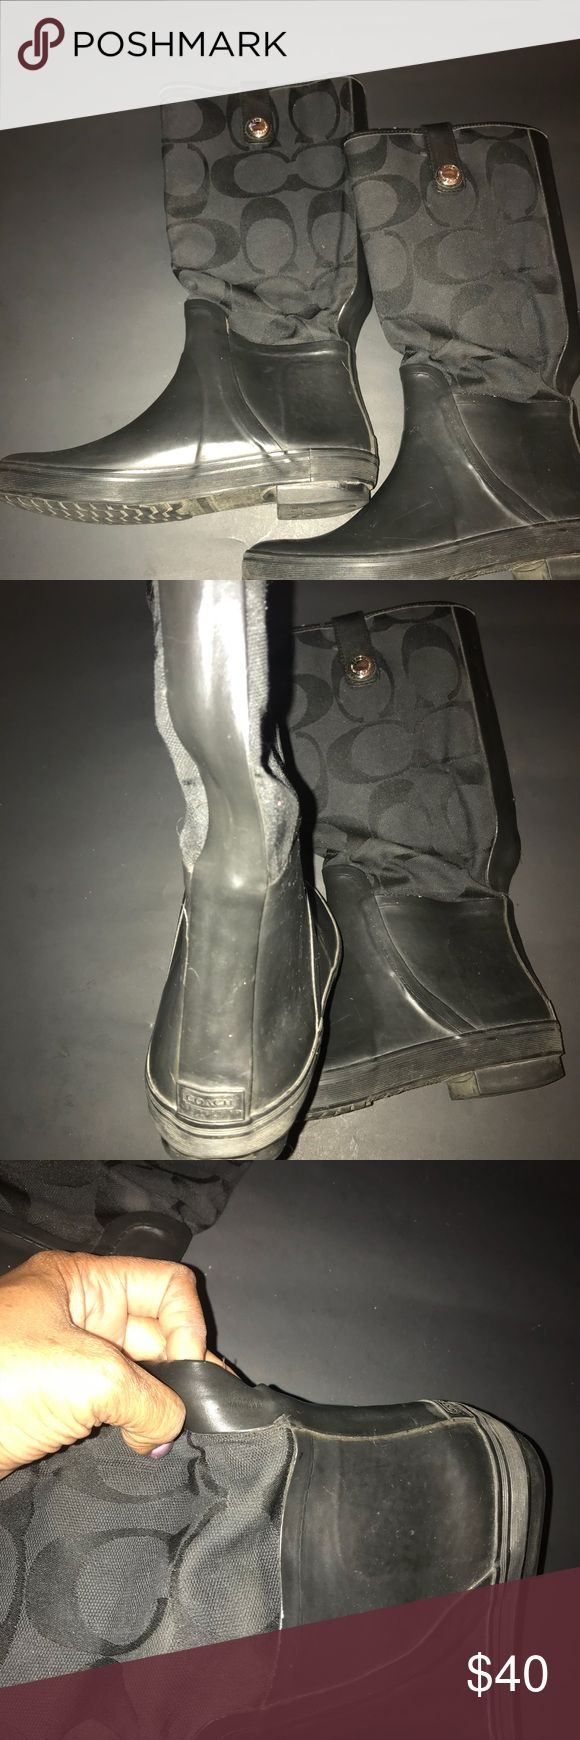 Coach Rain Boots 🌦🌧⛈ Black Authentic Signature Rain Boots, VUC, plenty of life left😁 Coach Shoes Winter & Rain Boots